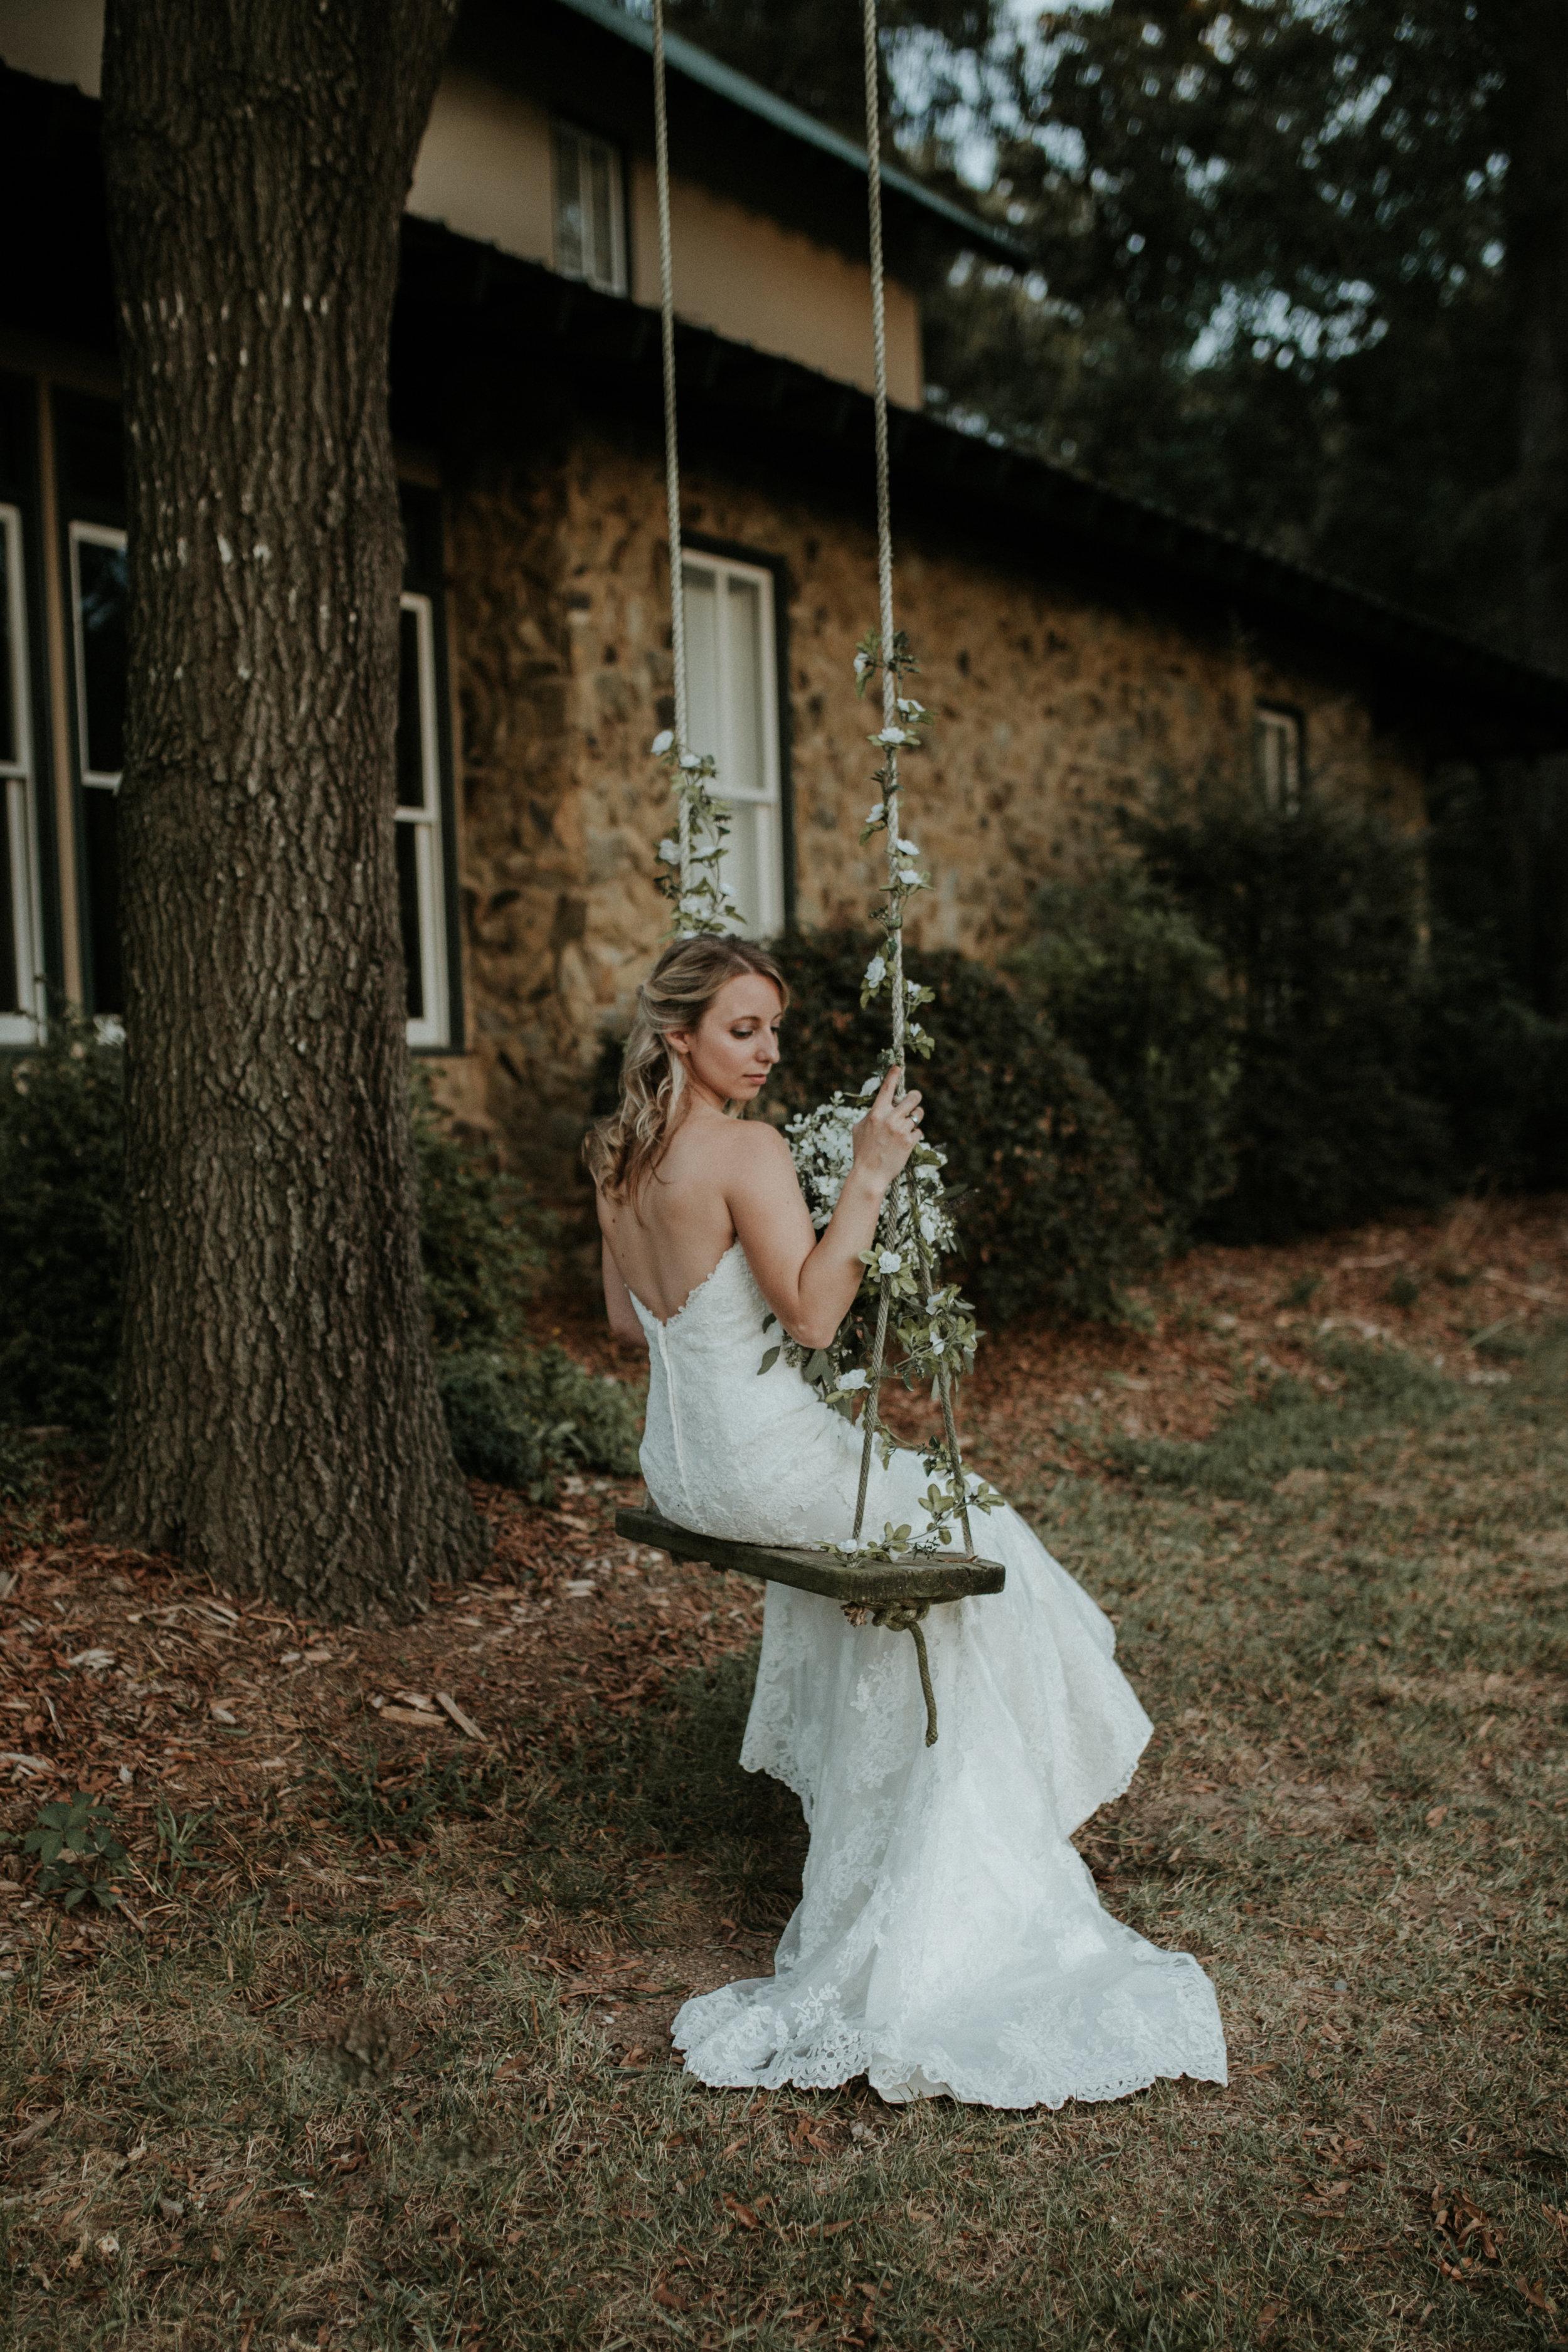 charlotte-wedding-photographer-morning-glory-farms-2472.jpg